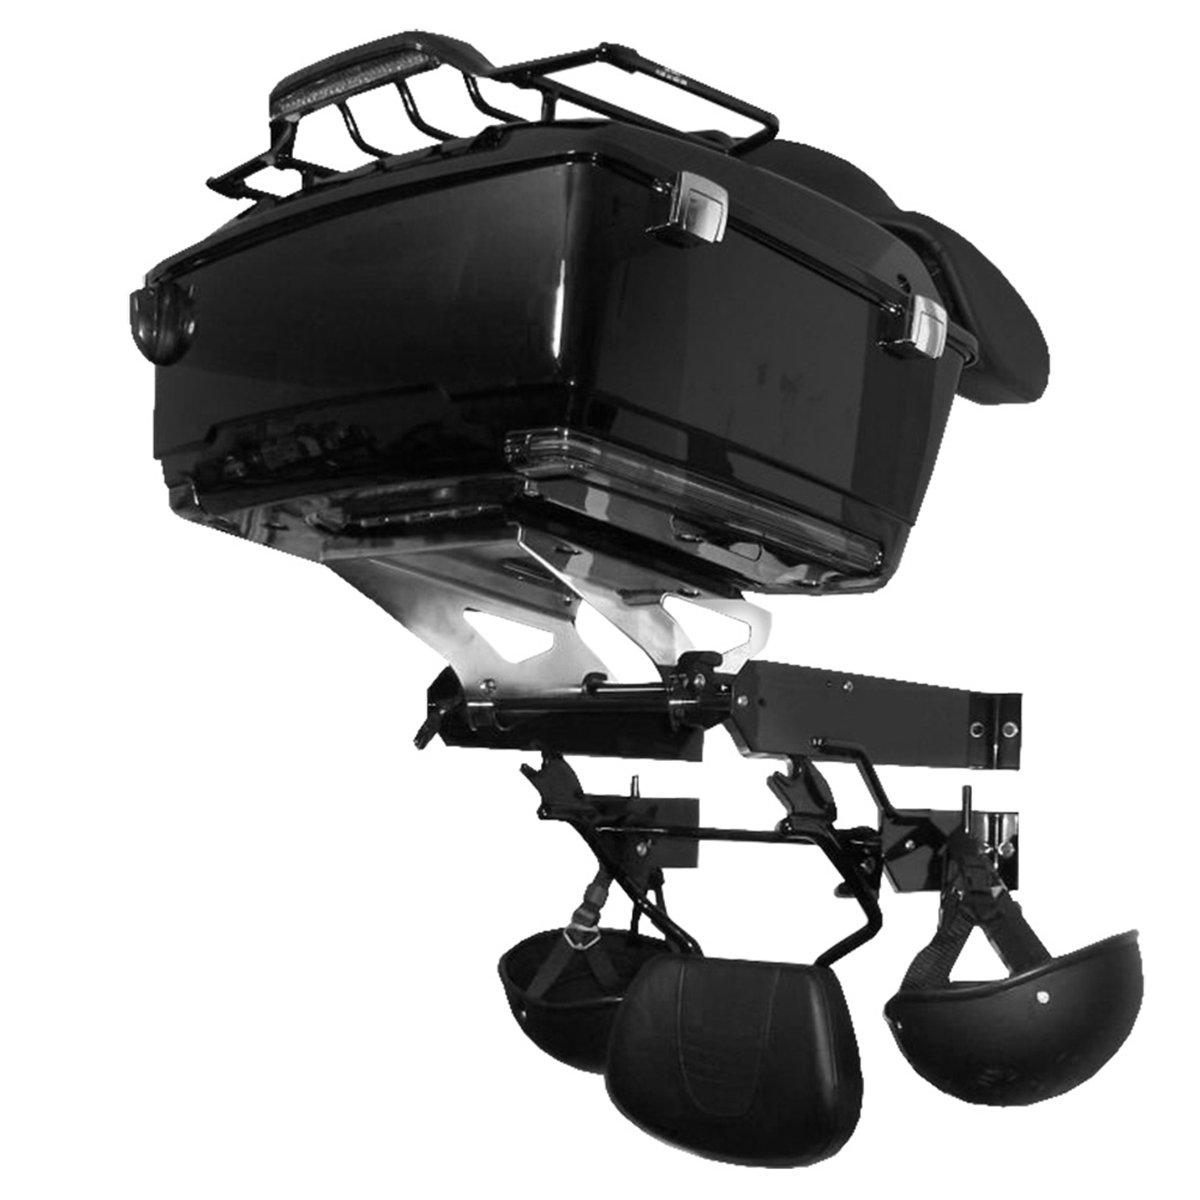 Tour-pak Trunk Helmet Accessory Storage Rack Shelf Organizer For Harley DavidsonTouring (5-7 Days Ships from the CA, US)